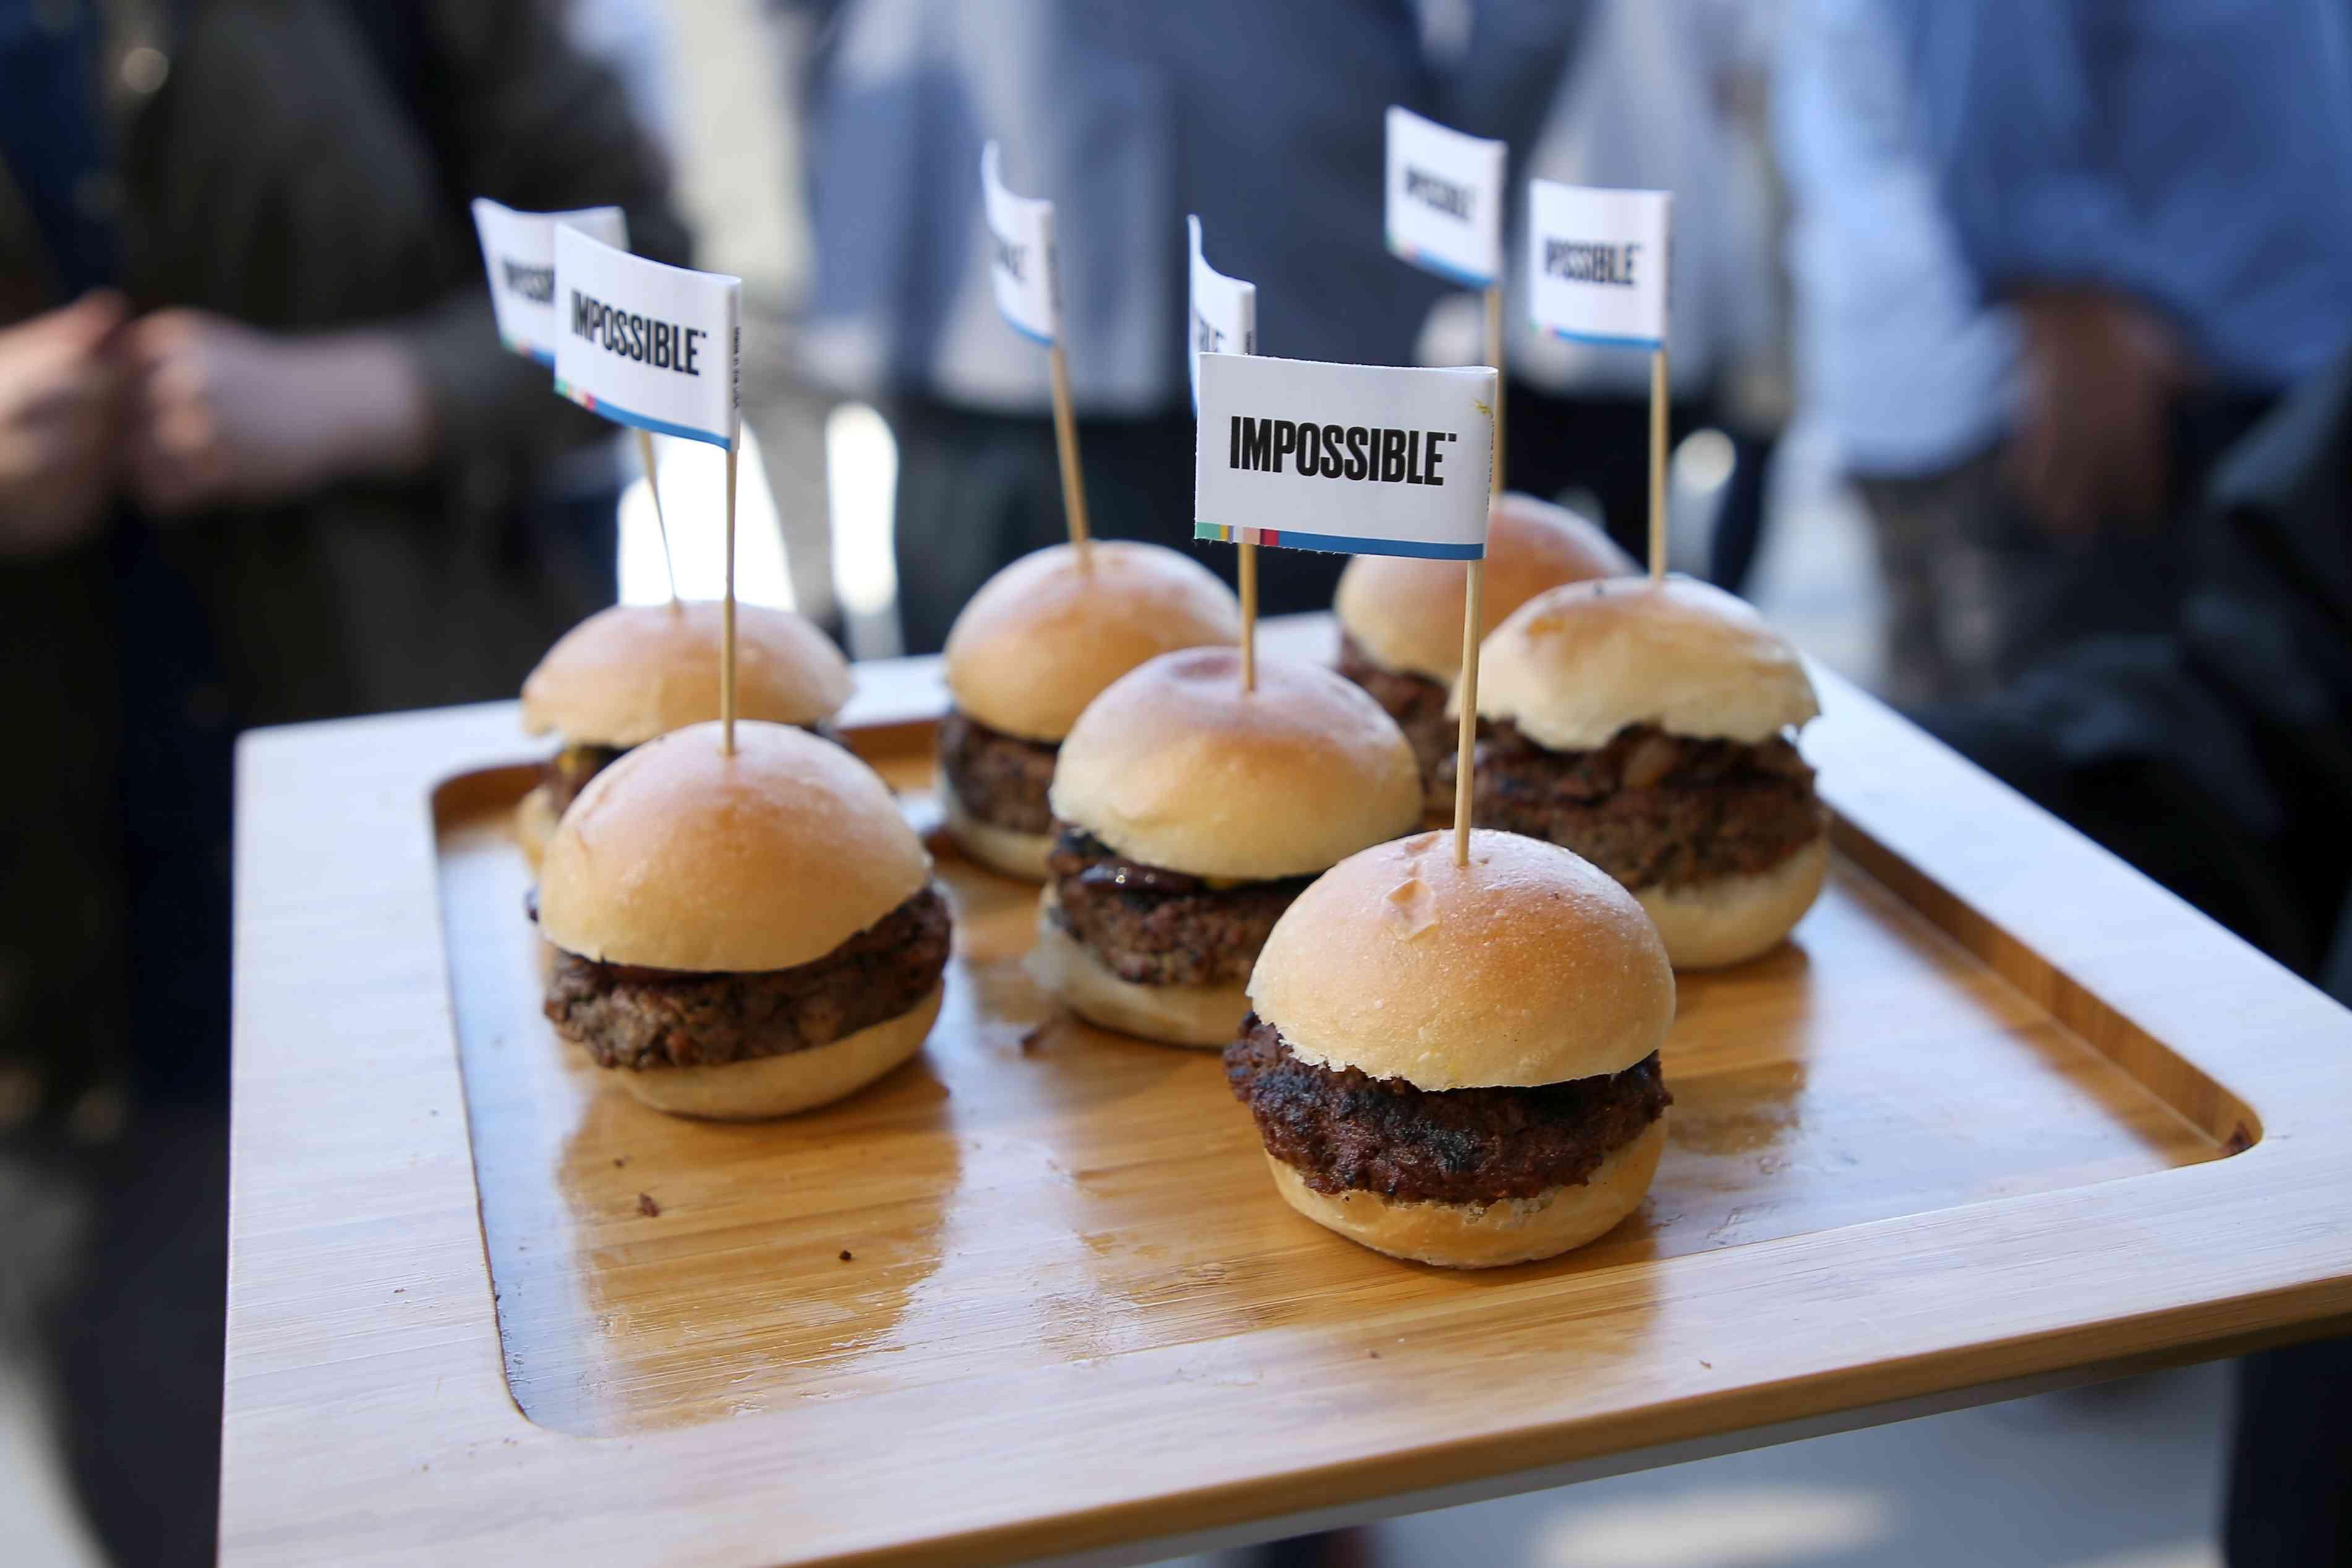 Impossible Burger sliders